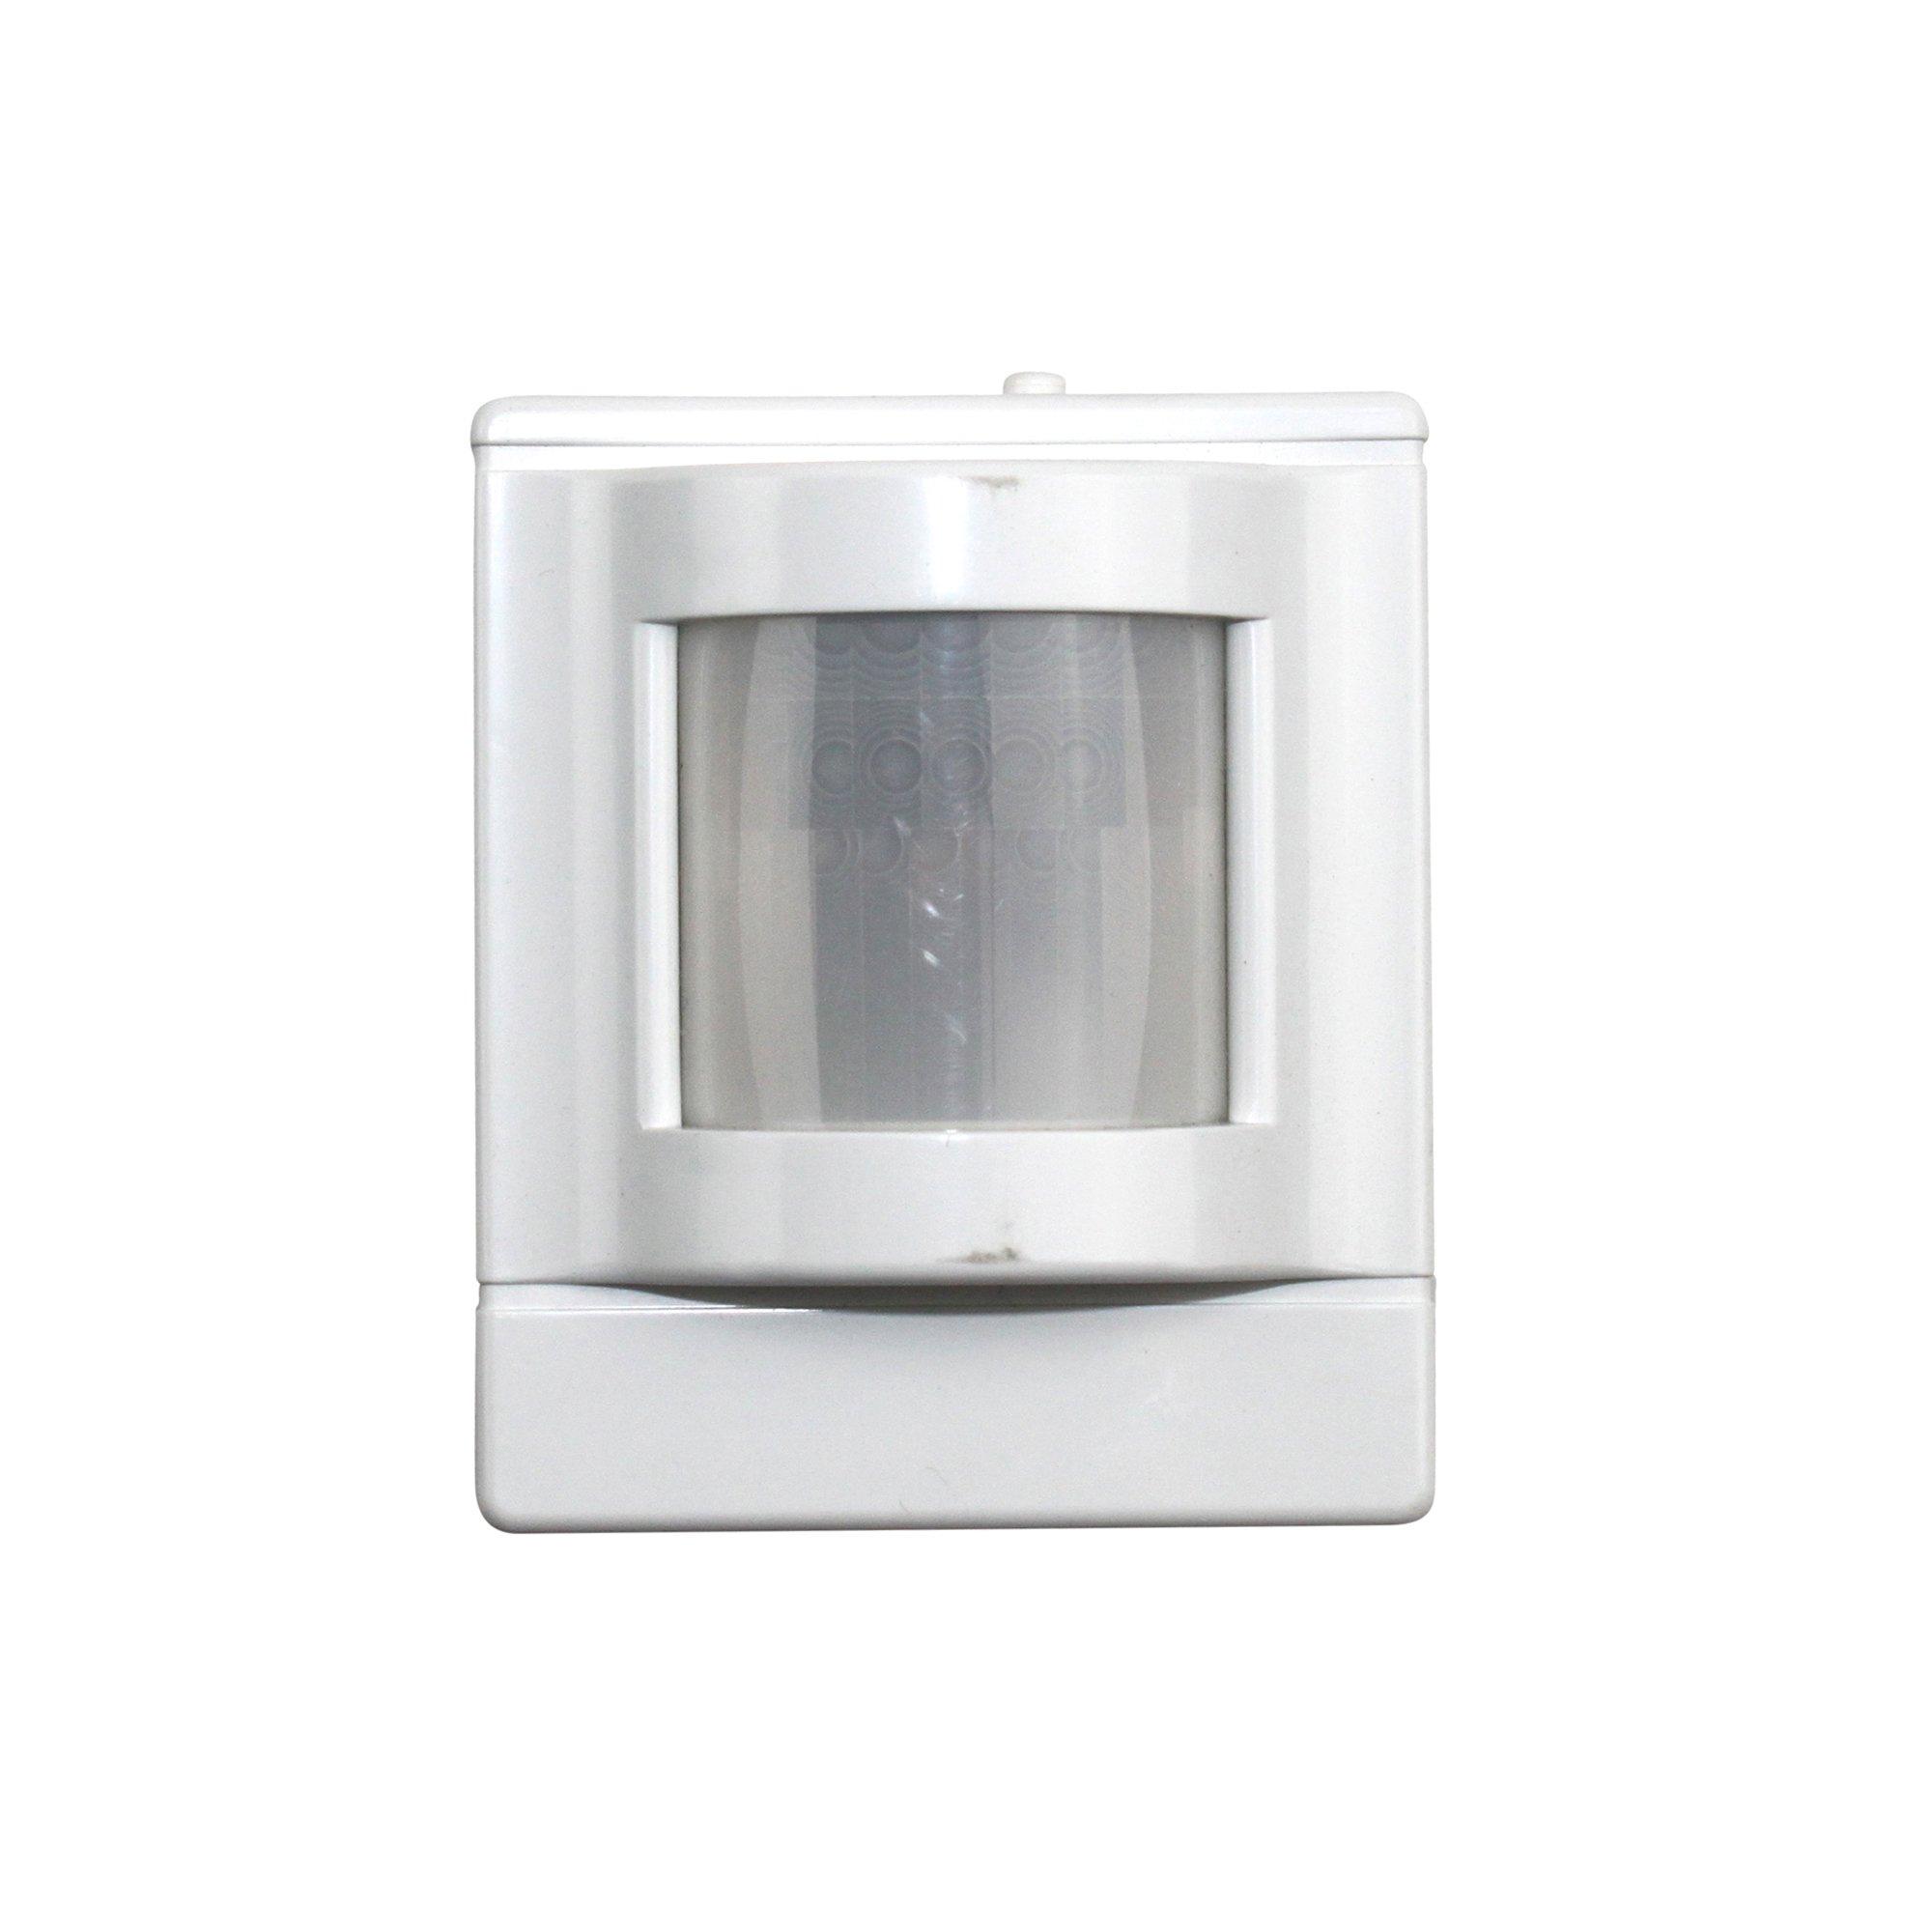 Sensor Switch HW-13 PIR Hallway Sensor Motion Occupancy Sensor Low Voltage, White